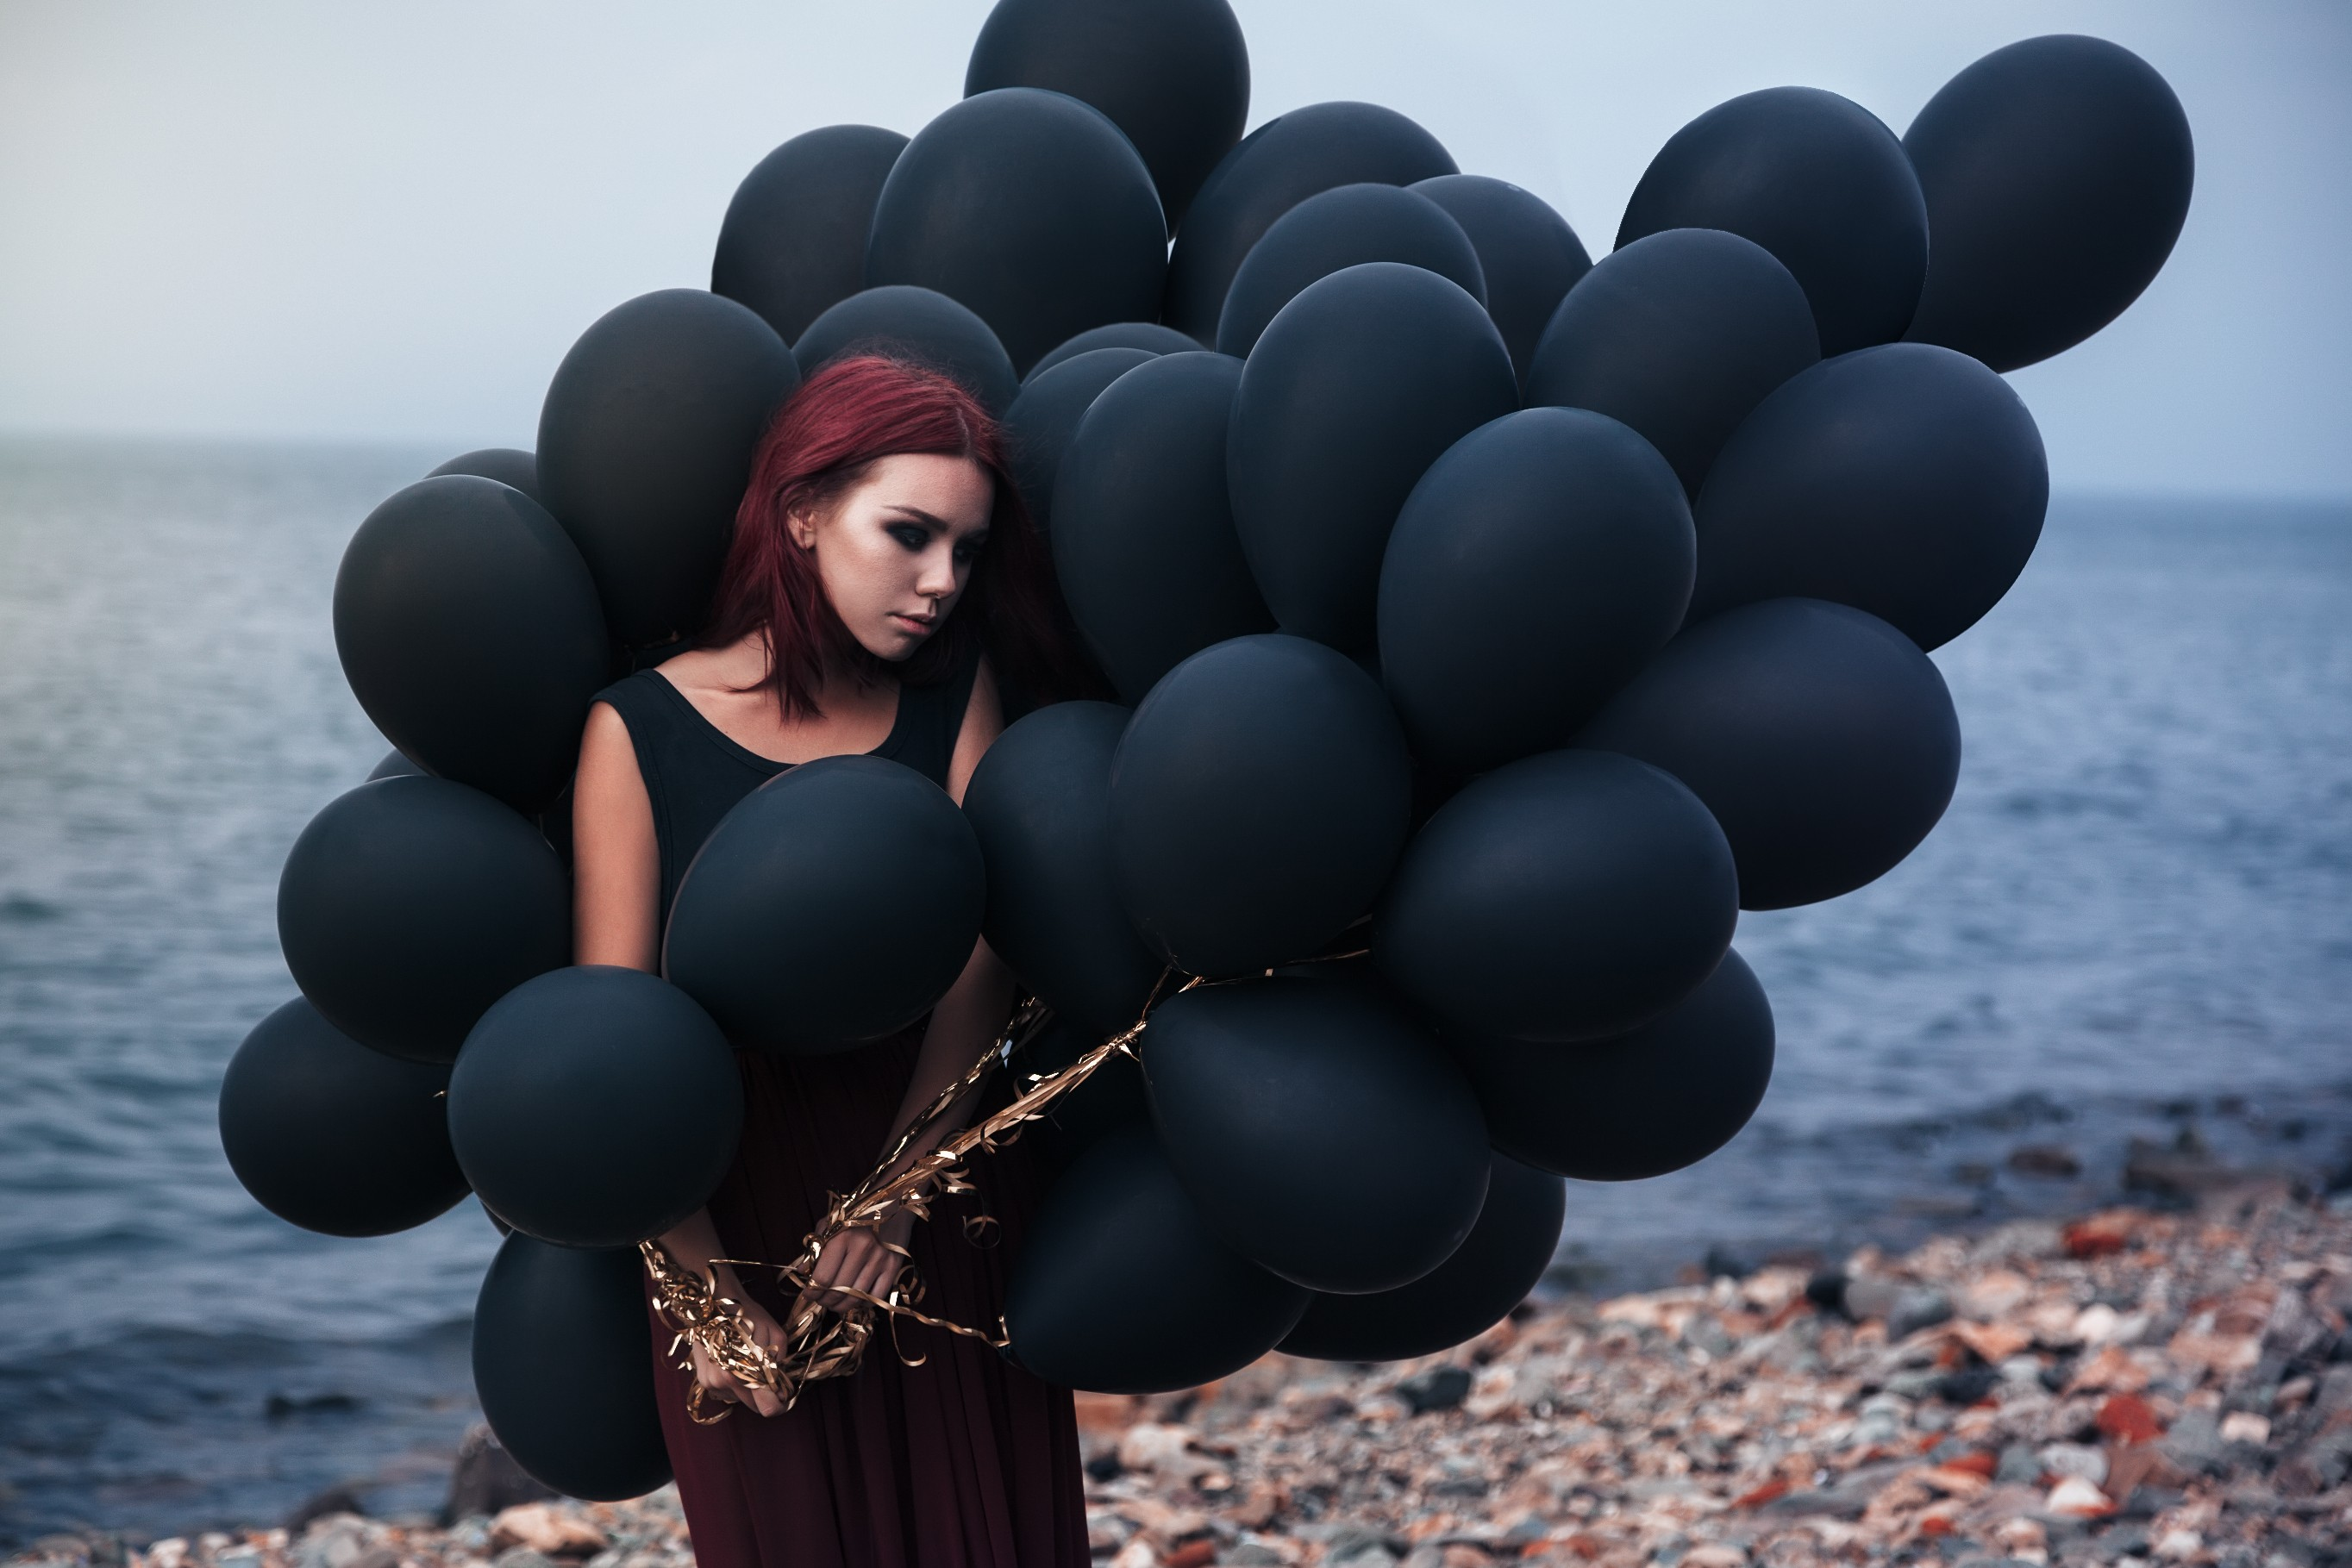 Girl With Black Ballons